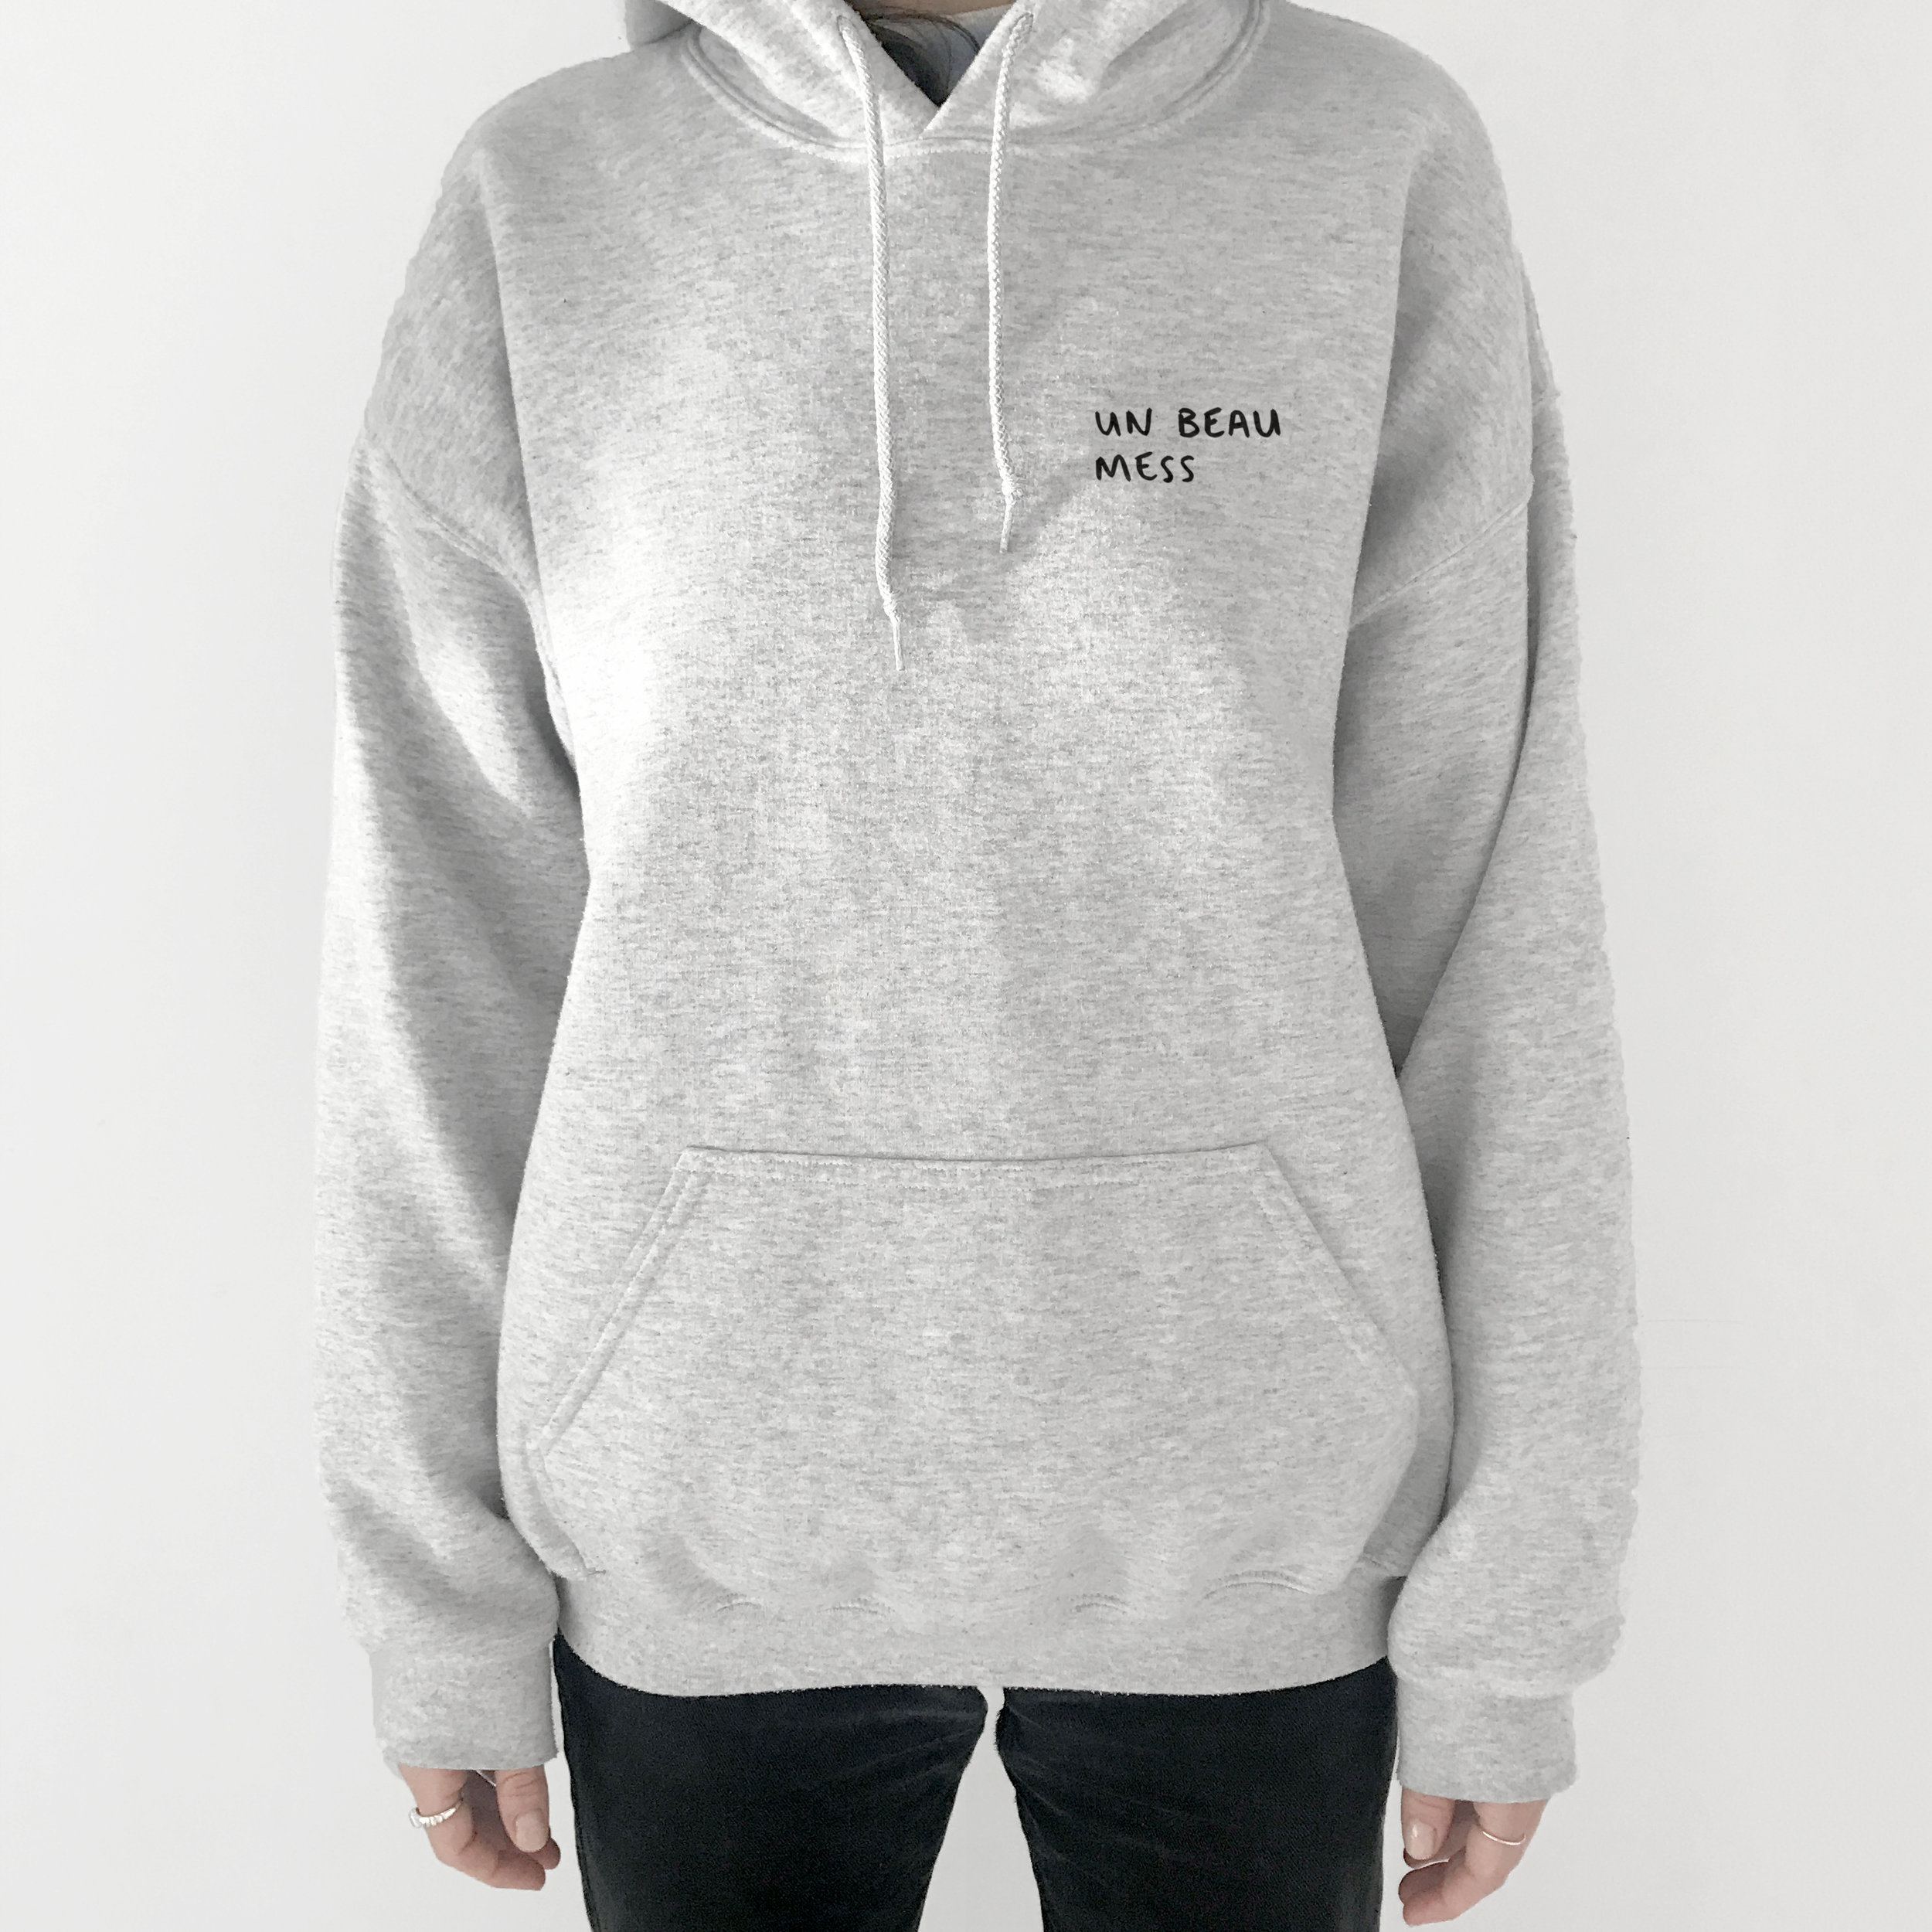 hoodie_mess_mannequin_front2.jpg